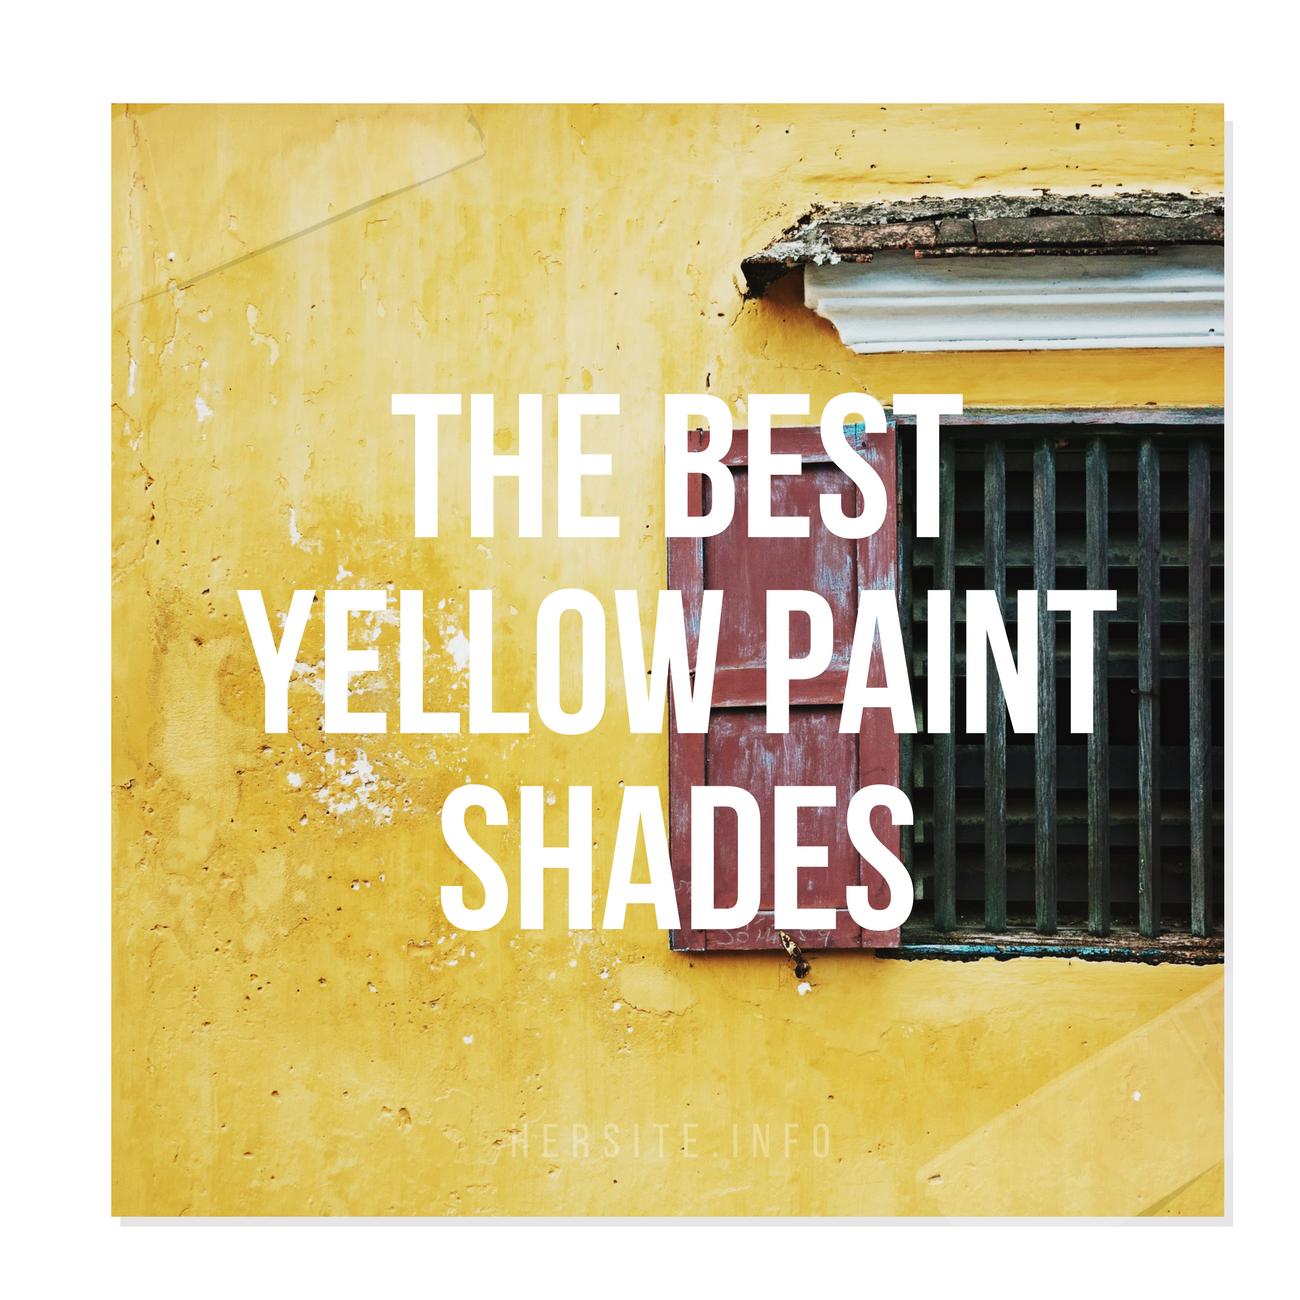 My favoritesl The Best Yellow Paint Shades Picked By House Beautiful Magazine, http://hersite.info/the-best-yellow-paint-shades-picked-by-house-beautiful-magazine/ ,  #BestYellowPaintColors #DecoratingWithYellow #HouseBeautifulMagazine